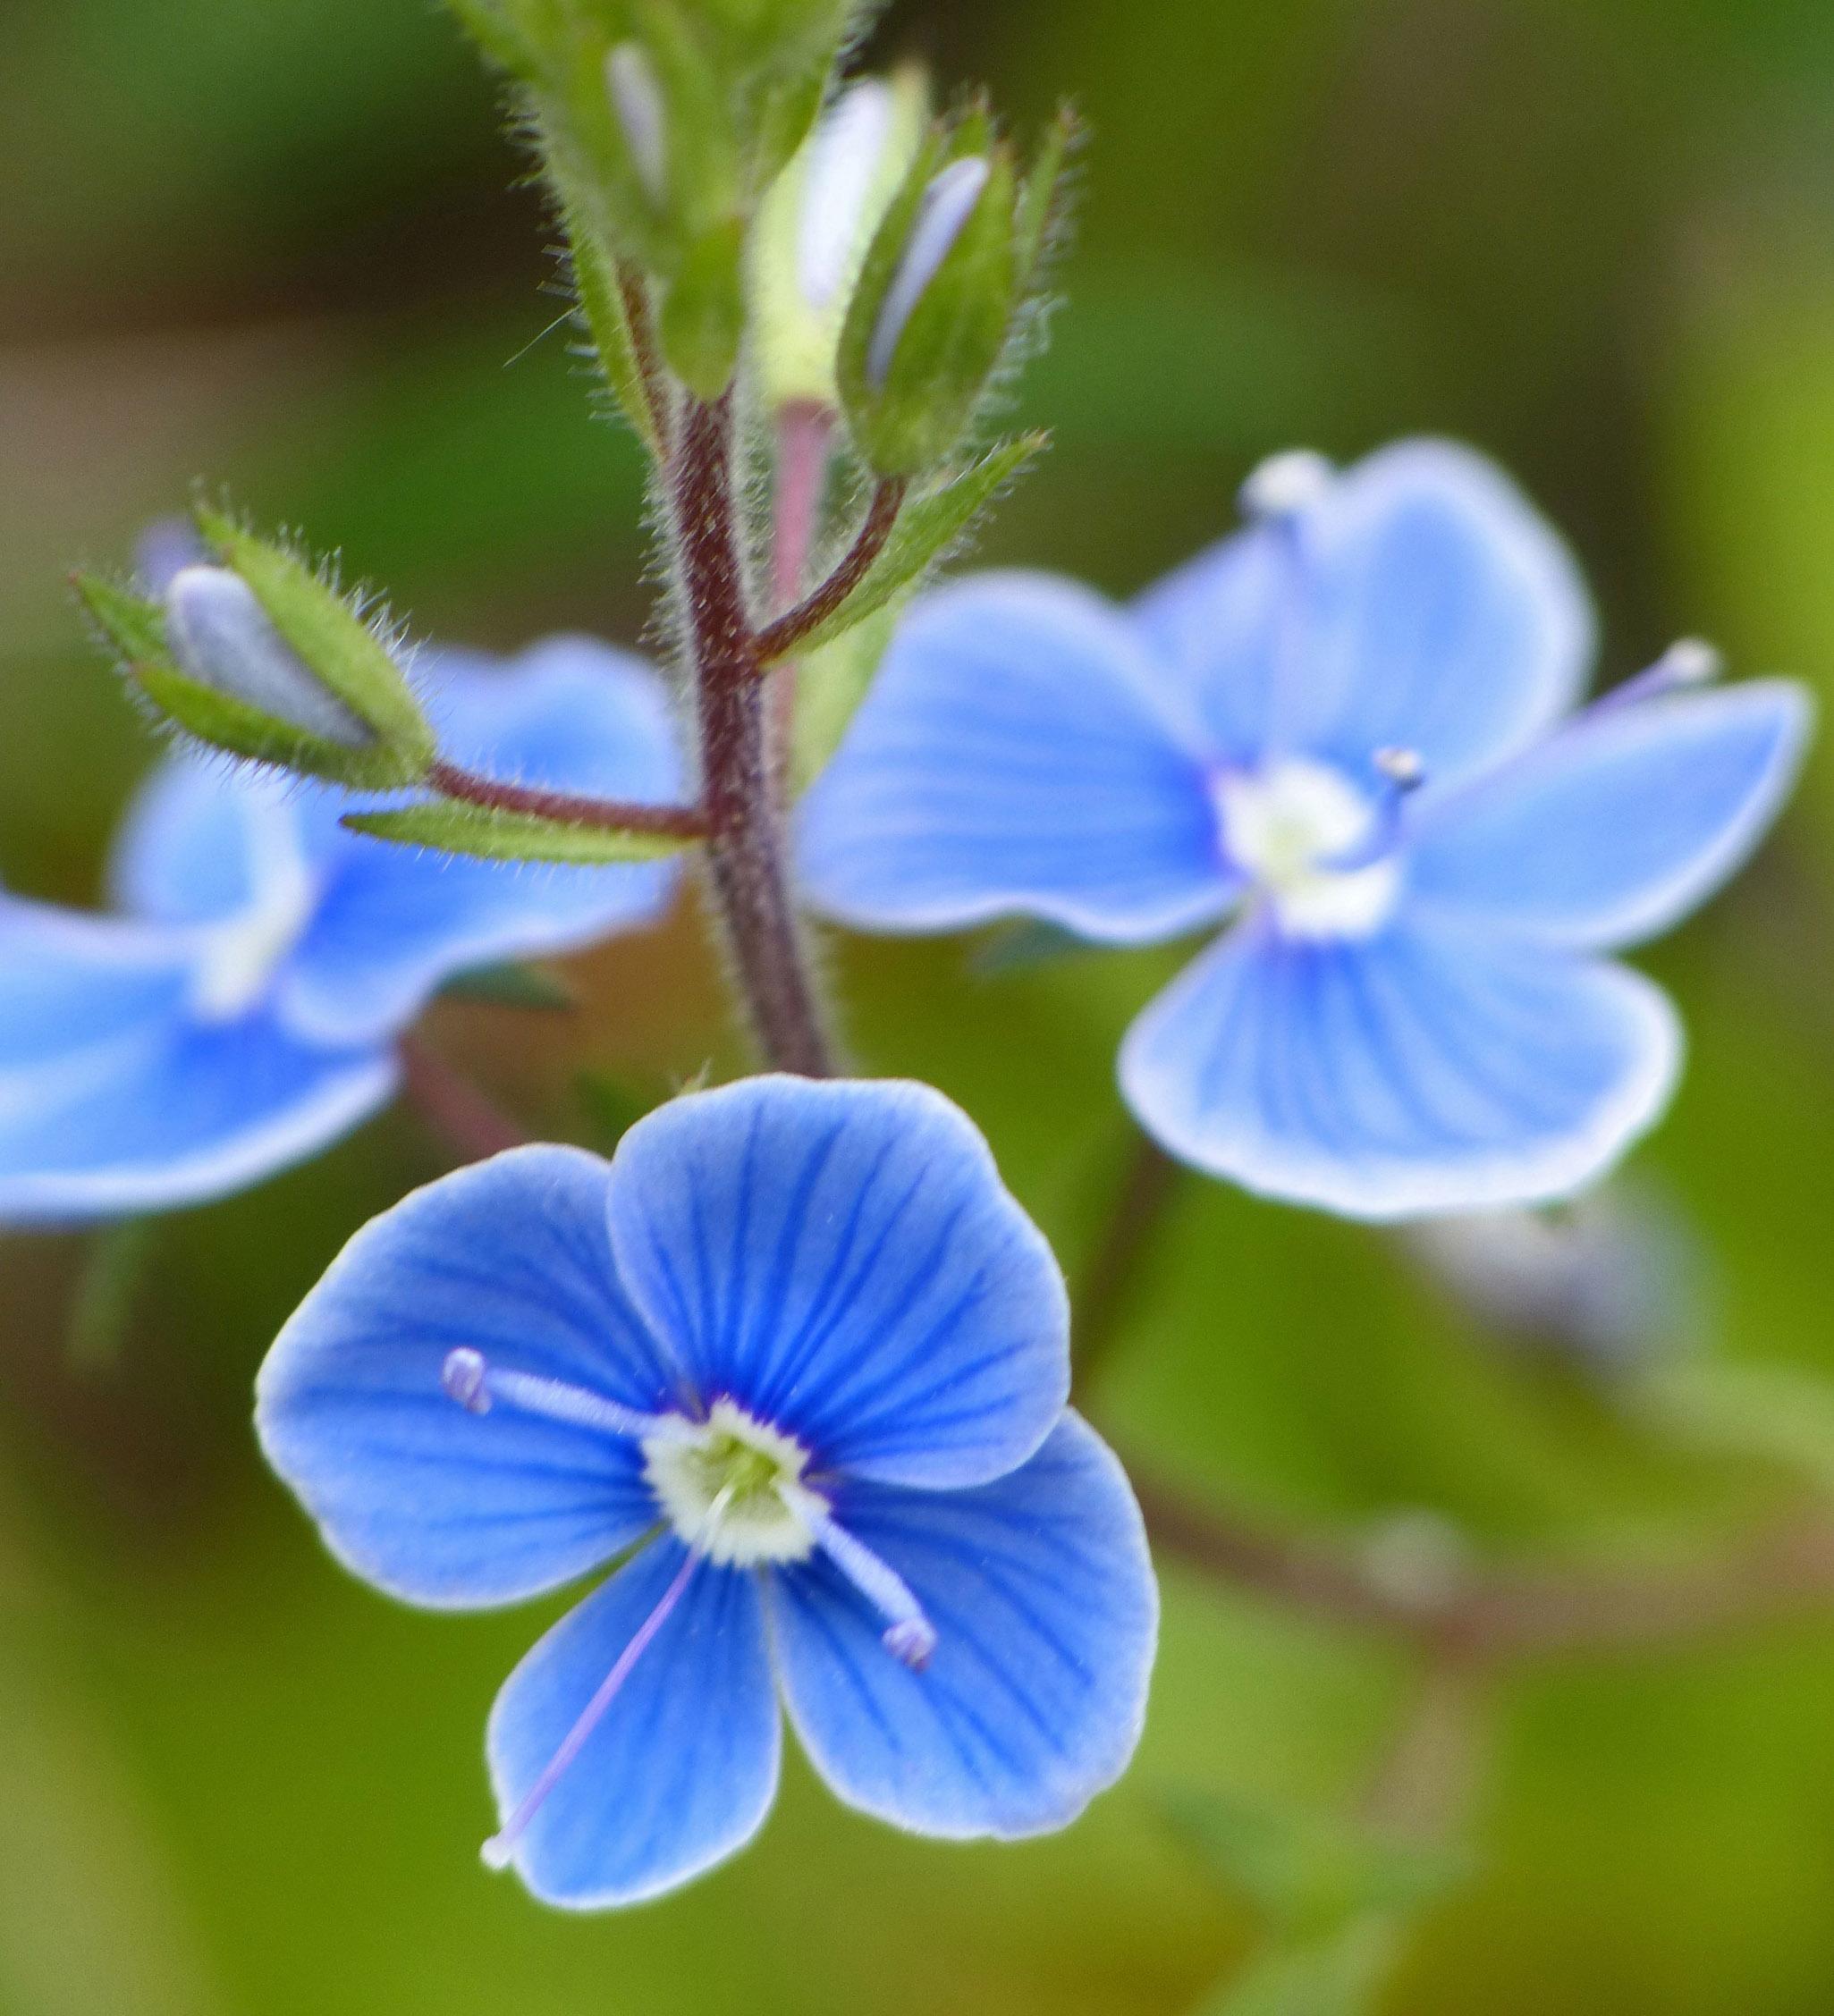 голубые незабудки и алый иван чай